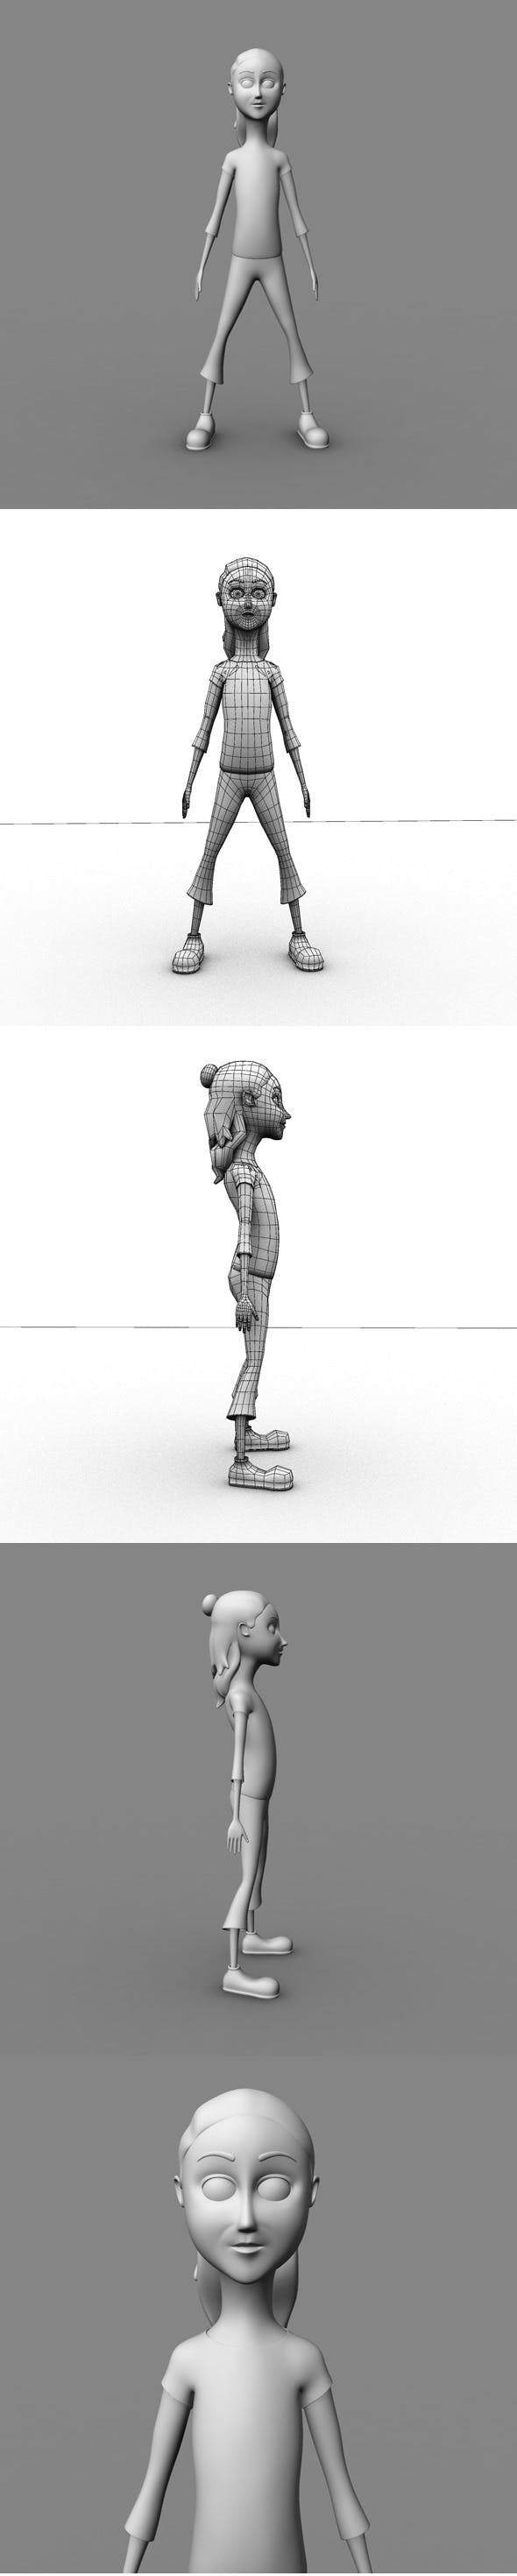 Base Mesh Cartoon Girl - 3DOcean Item for Sale